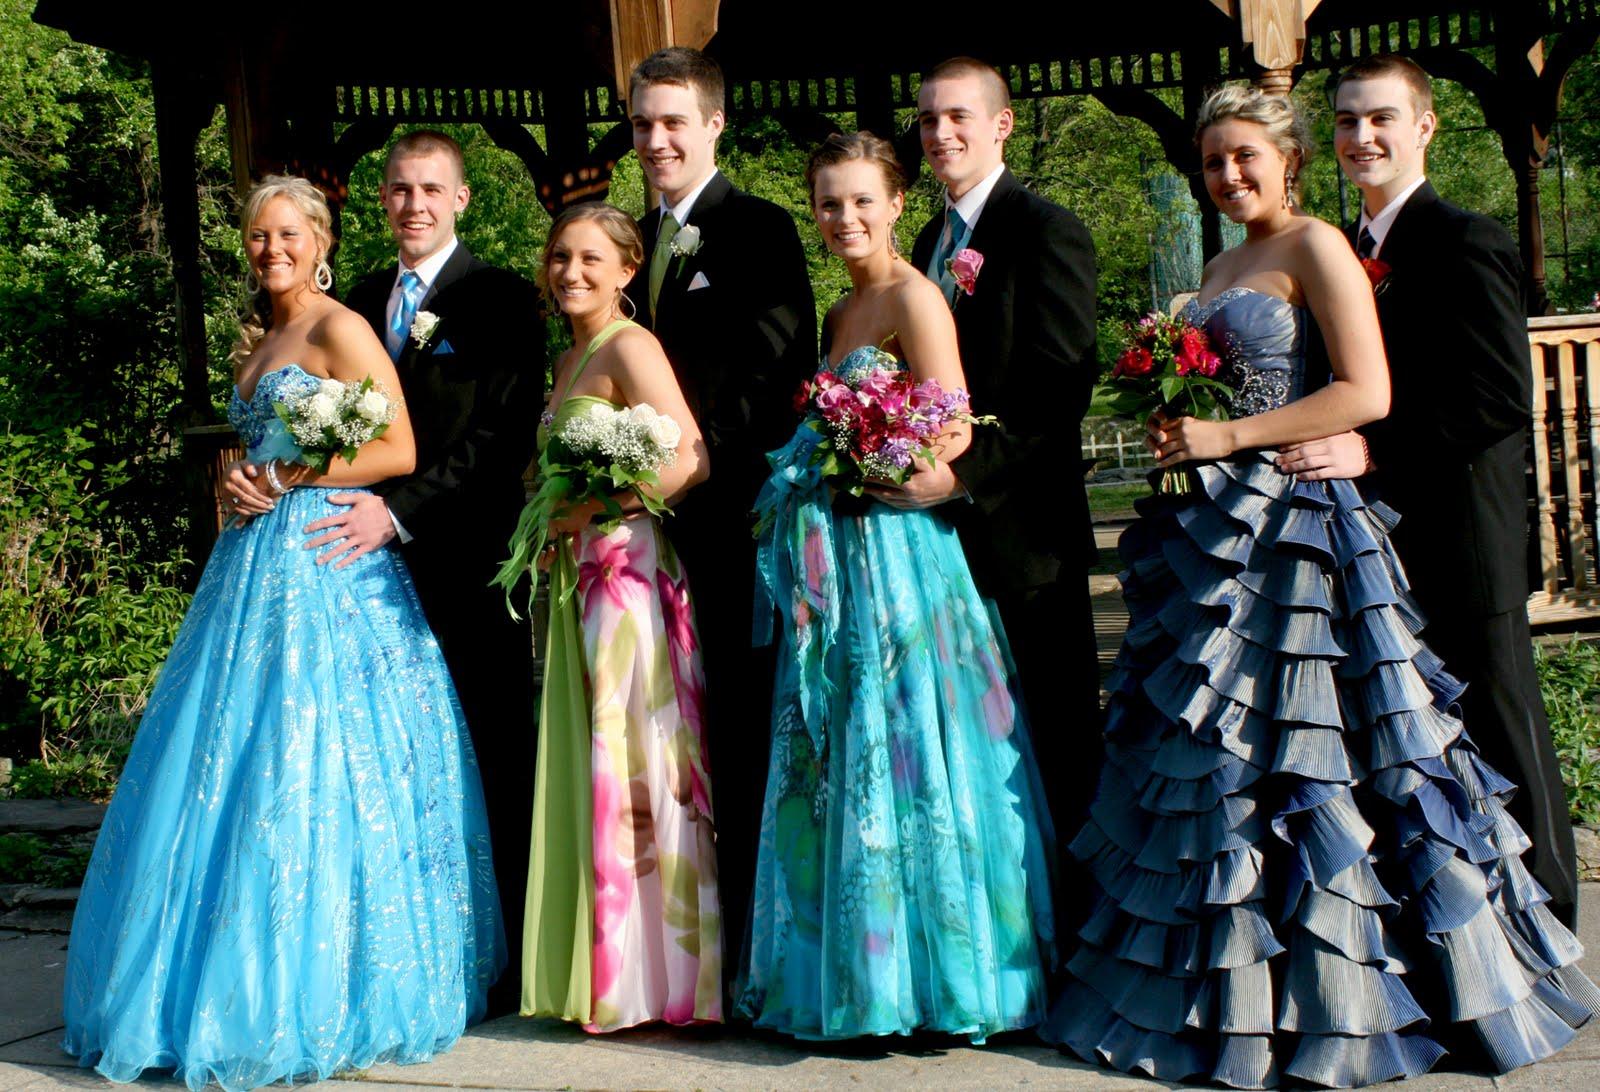 Raining Blossoms Prom Dresses: Guys